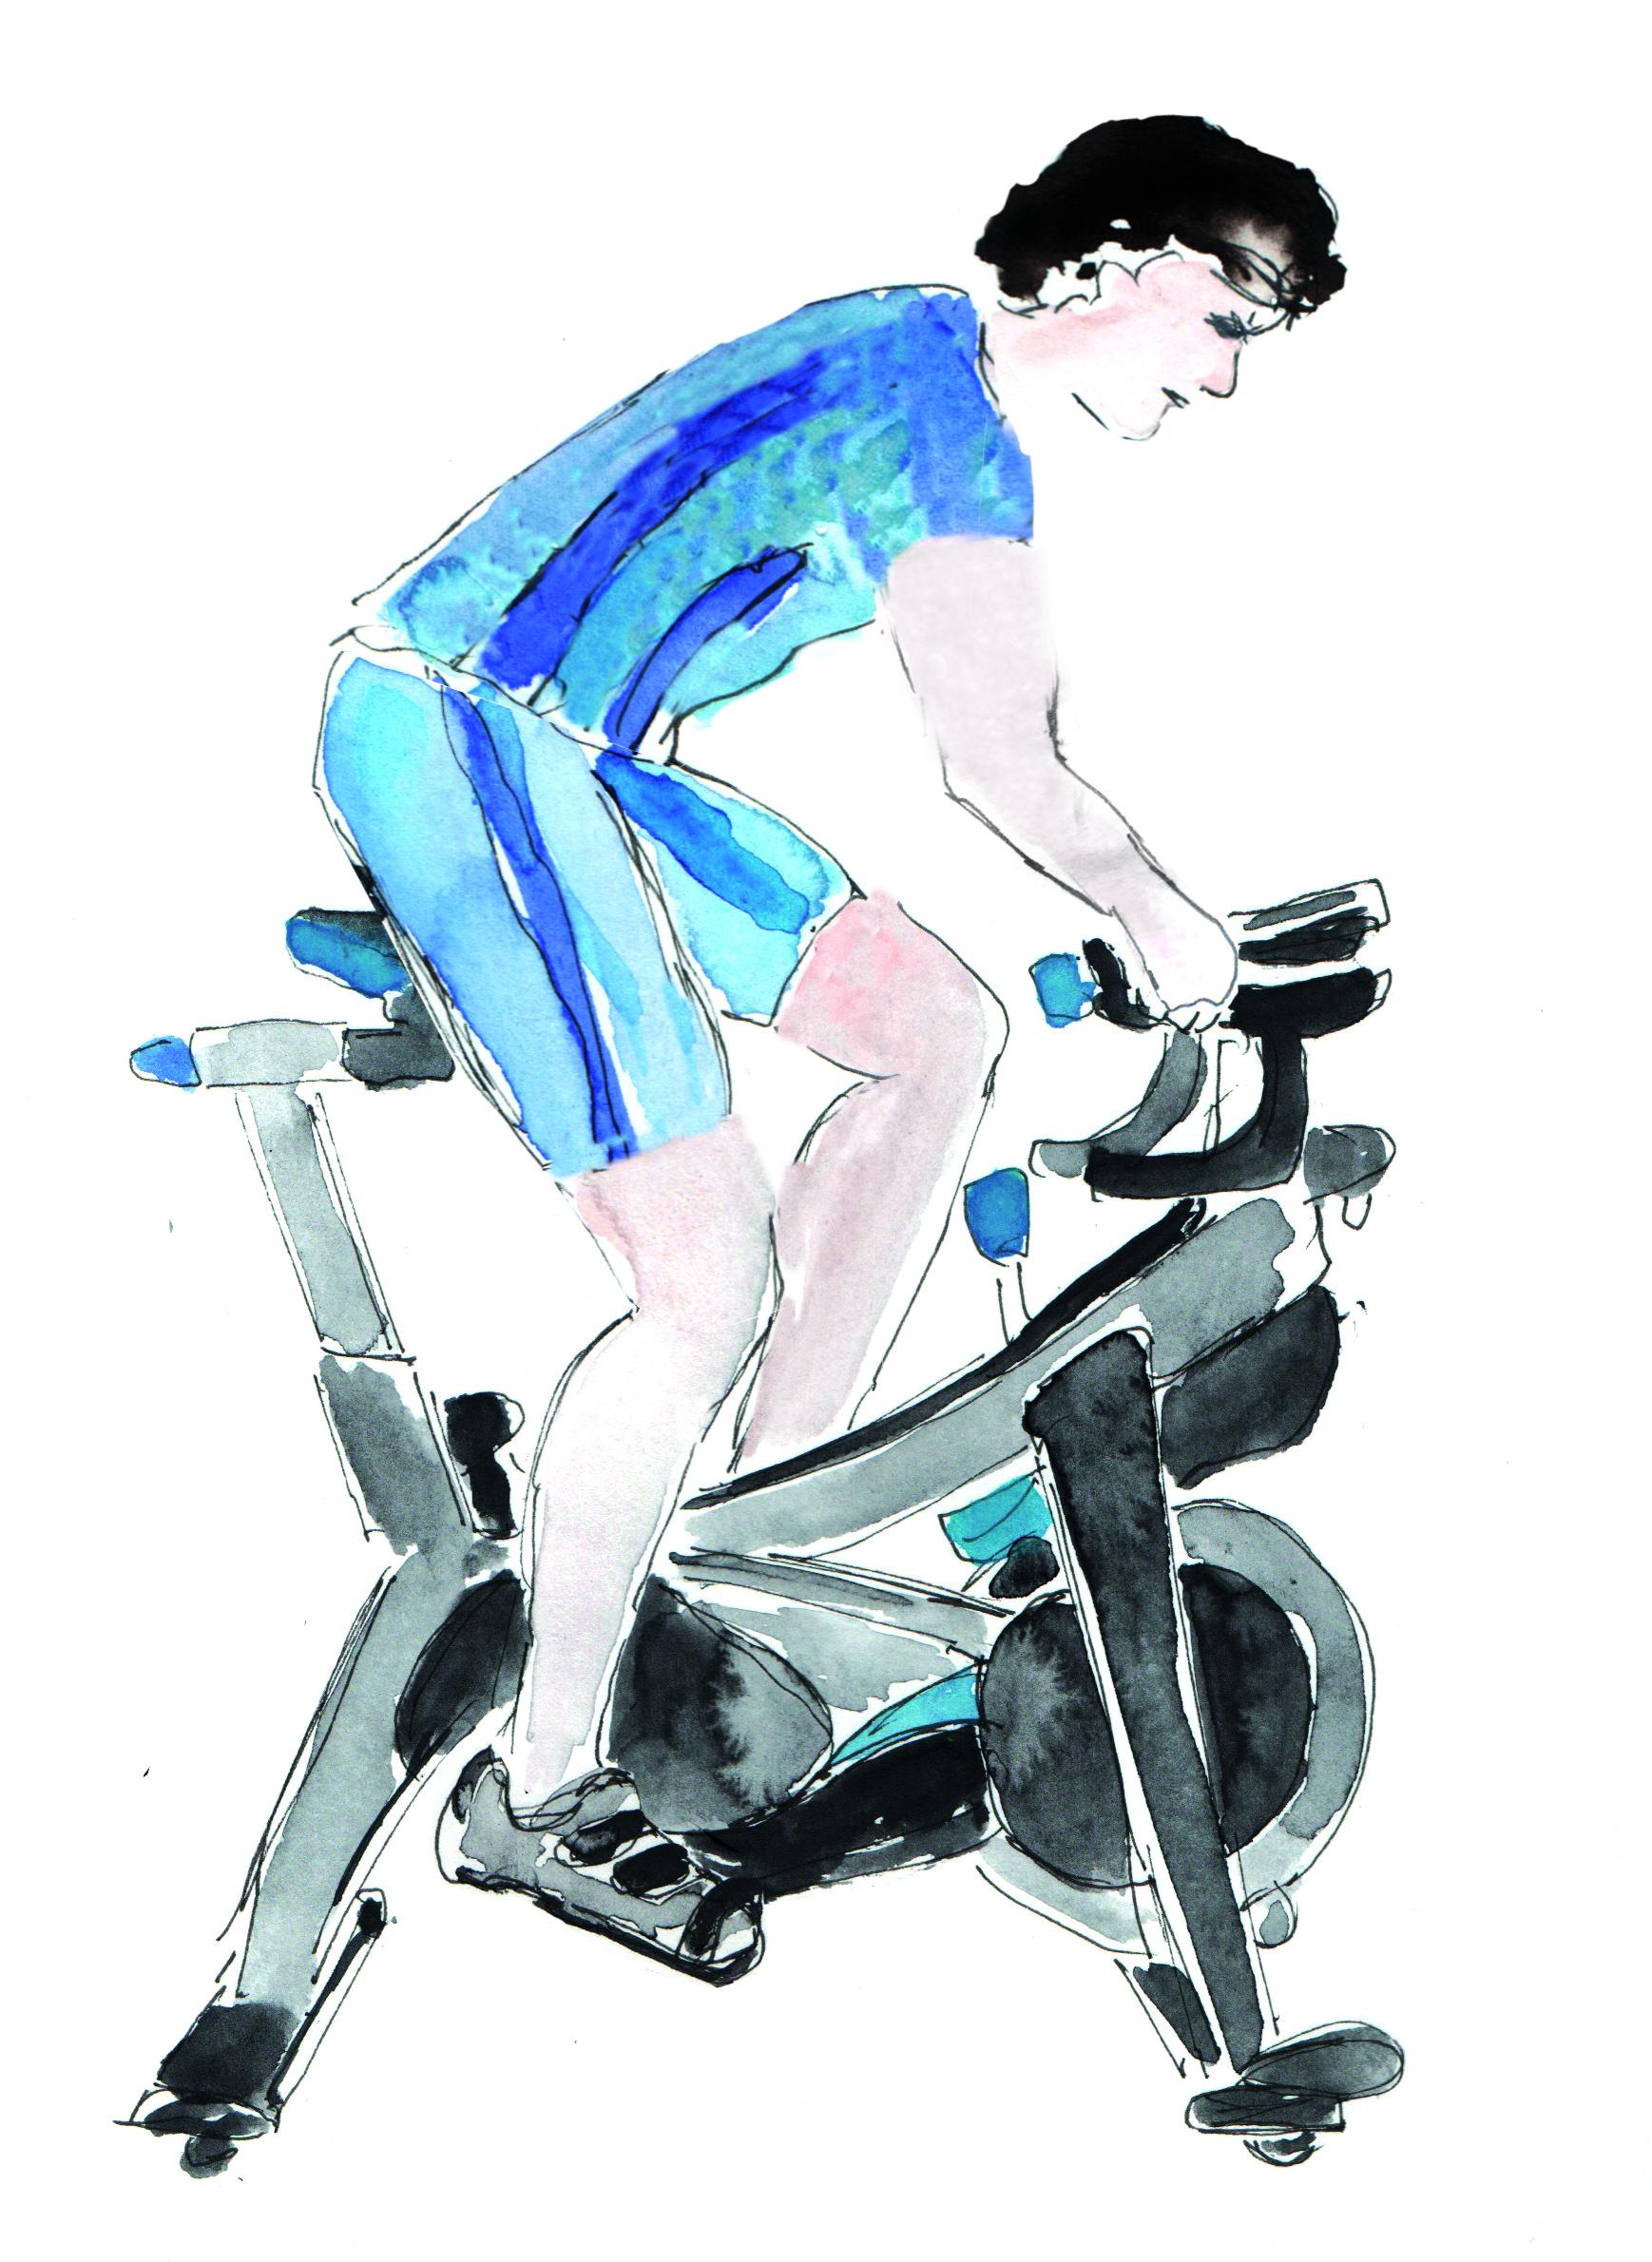 cycle-neu.jpg